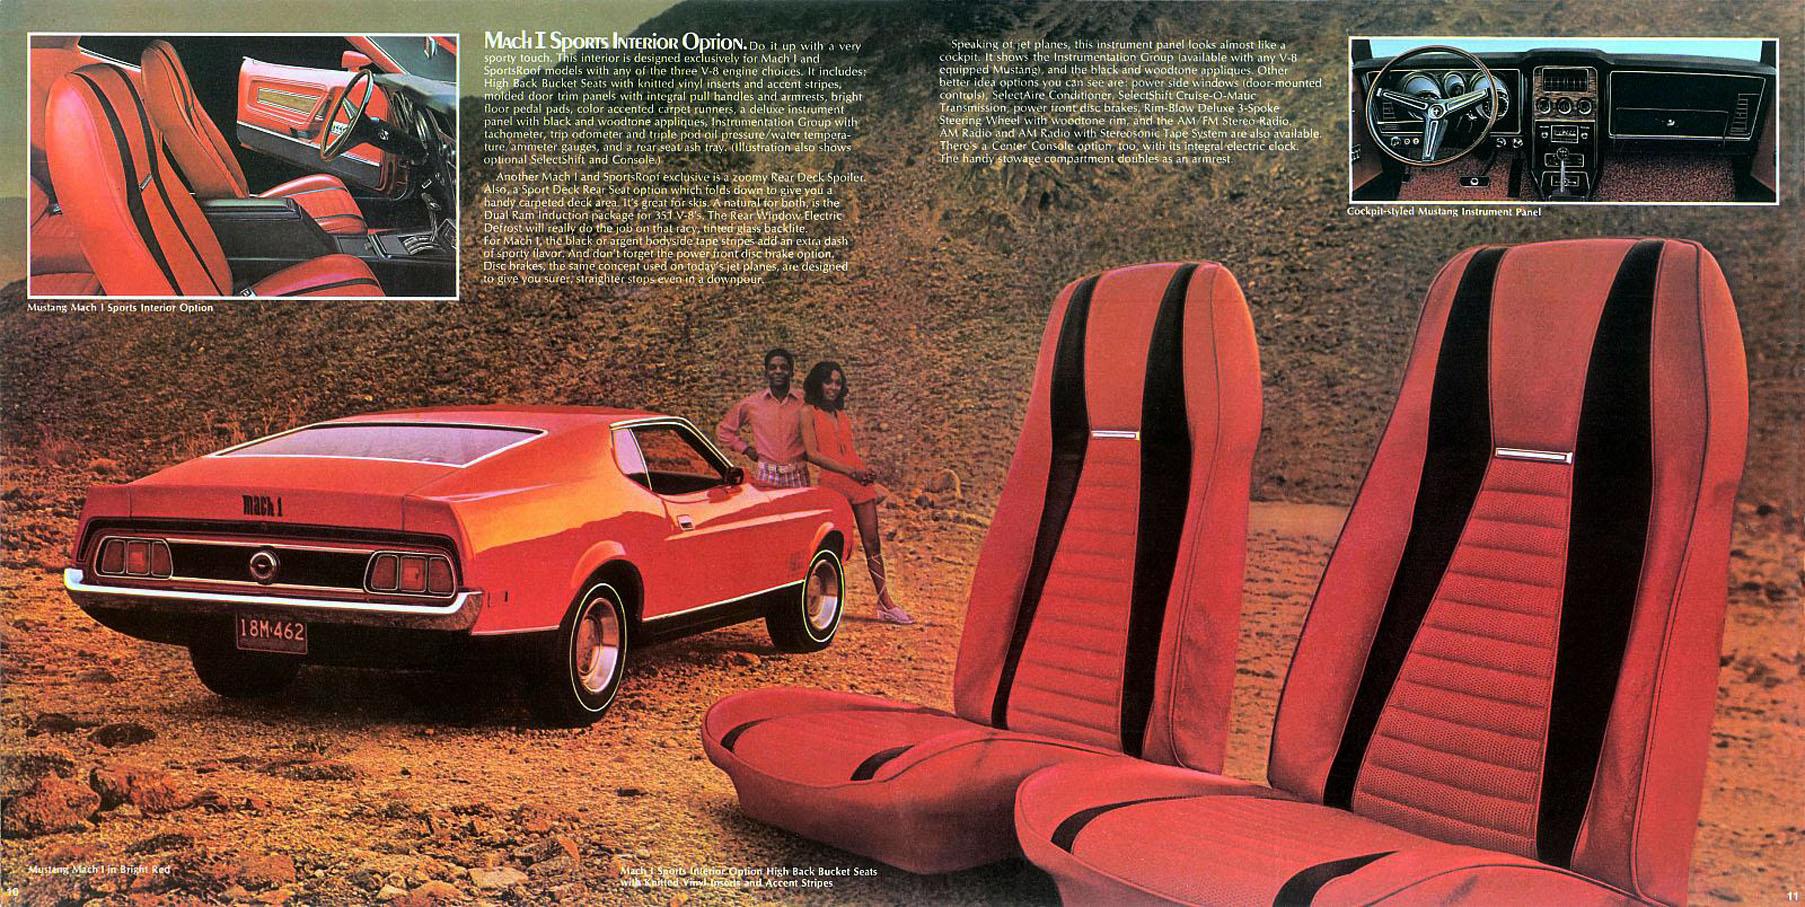 1972 Mustang Mach 1 - sports interior option